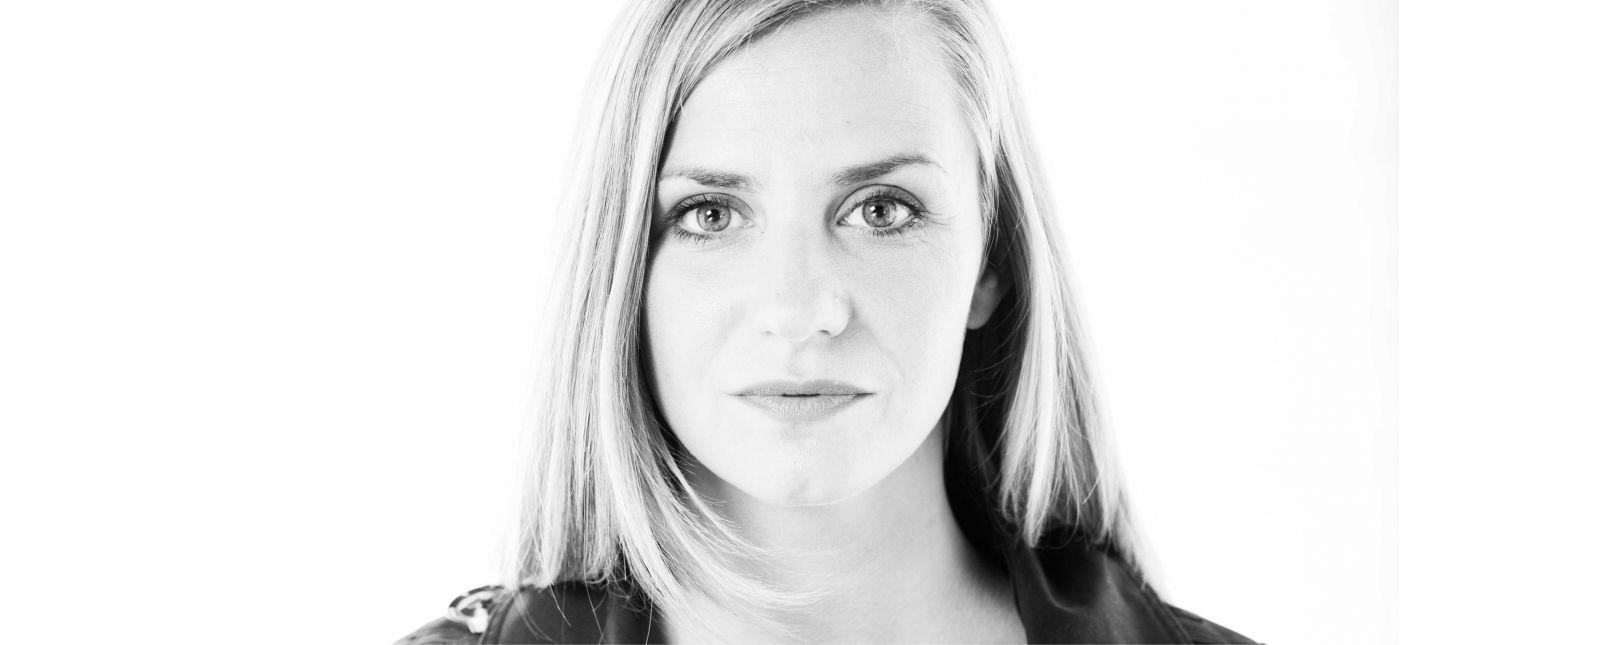 Marieke Kregel  2017; Sebastian Mölleken